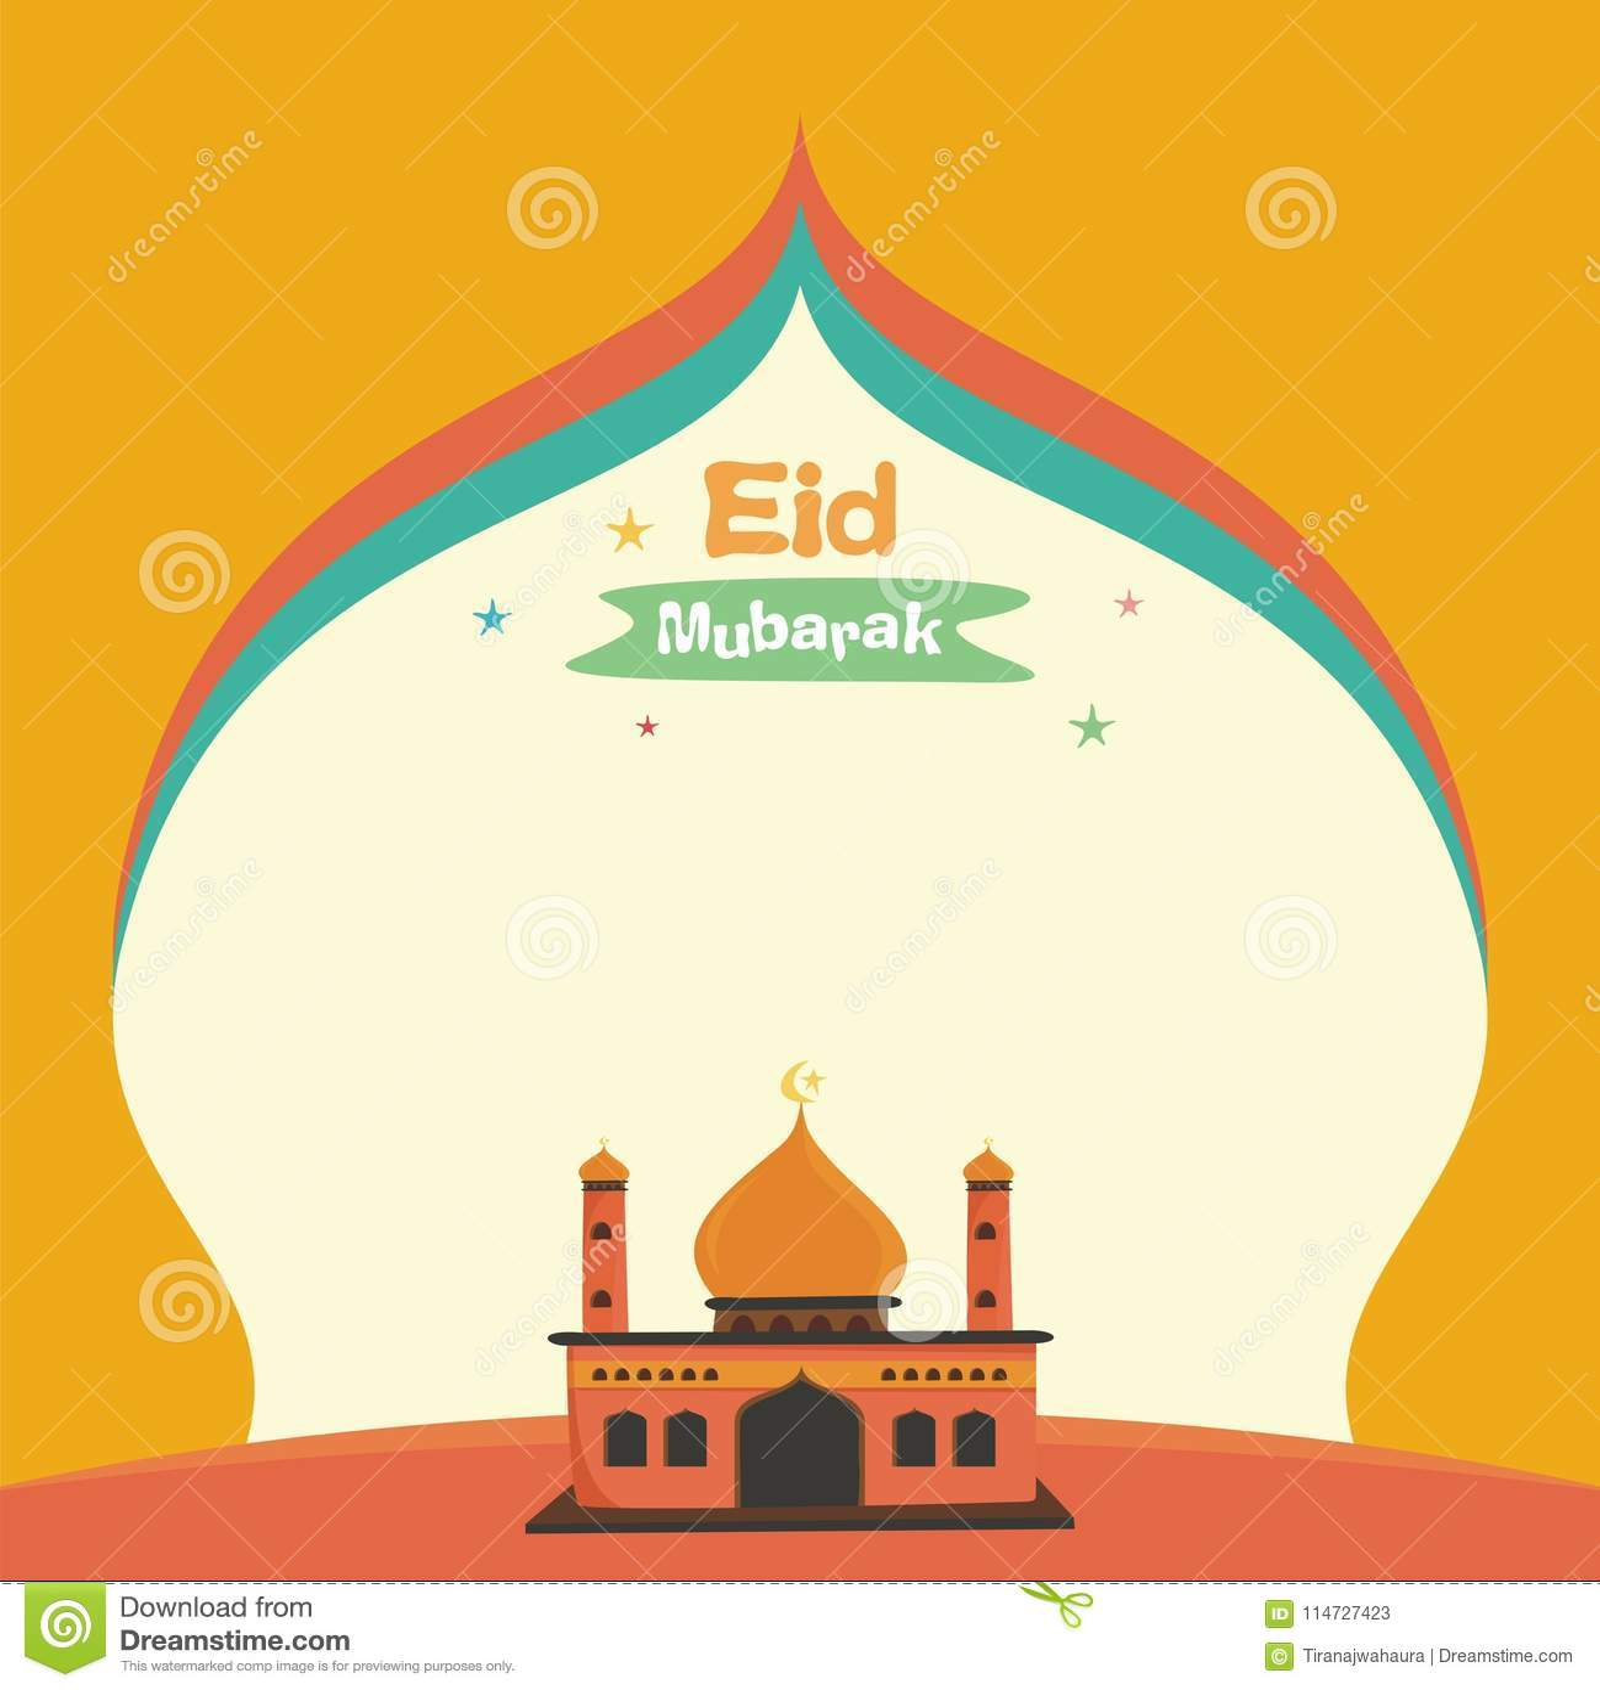 Lovely Cartoon Eid Mubarak Card